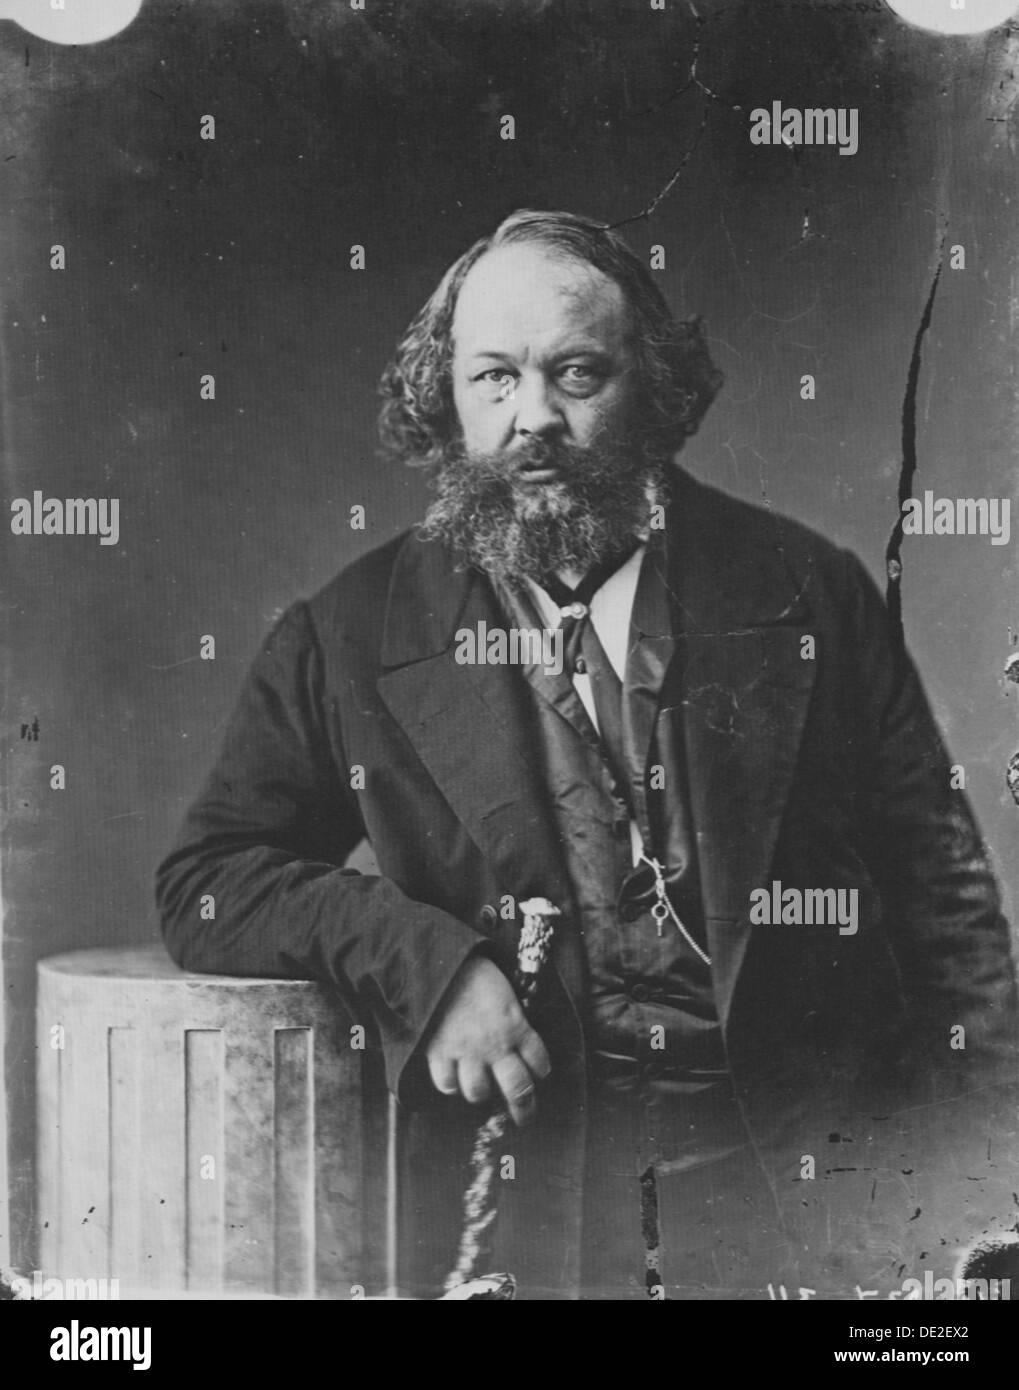 Mikhail Bakunin, Russian revolutionary and theorist of anarchism, c1863. Artist: Gaspard-Felix Tournachon - Stock Image